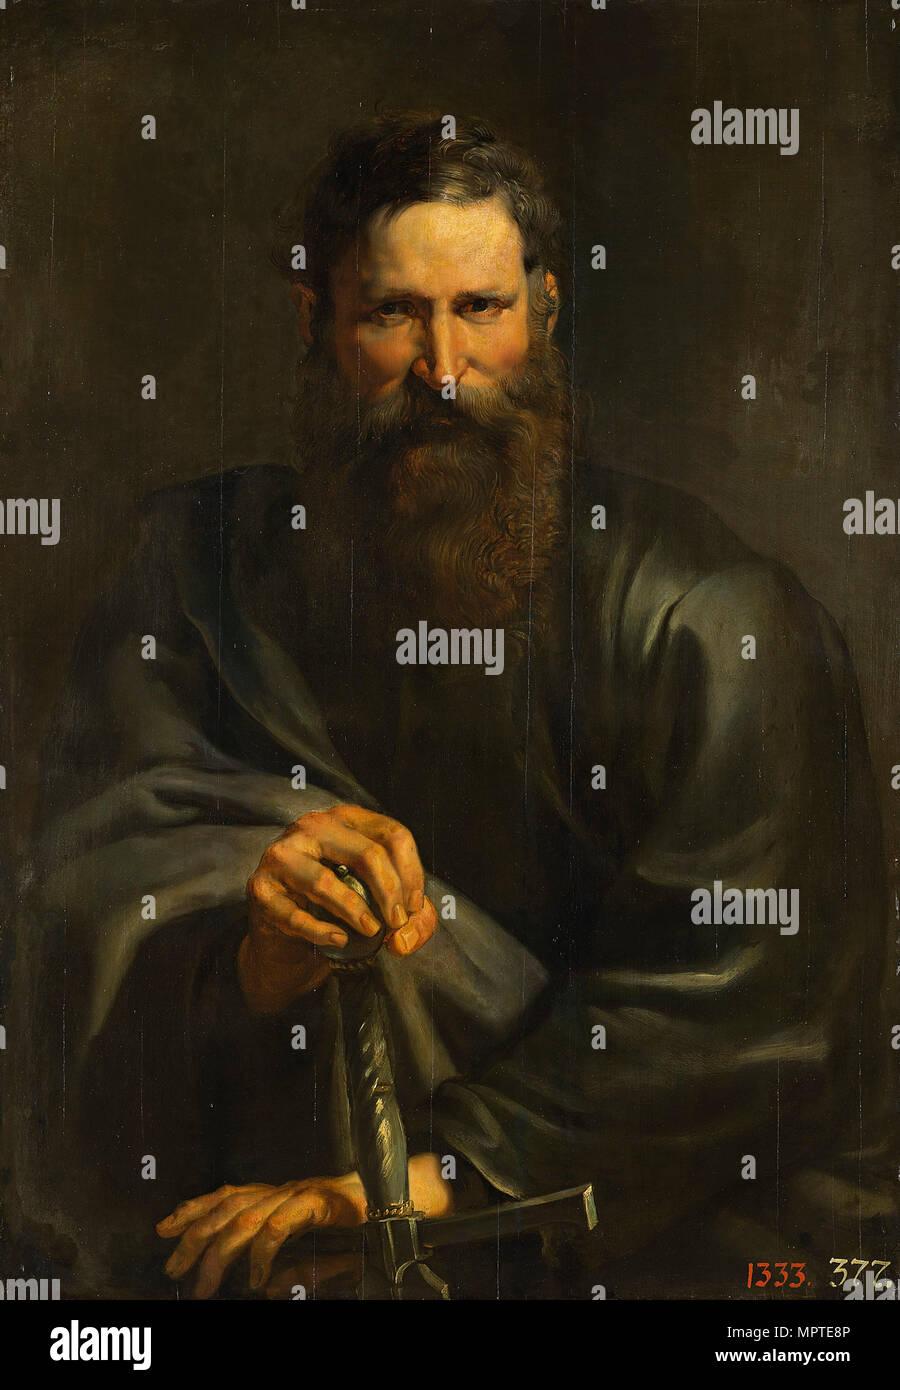 The Apostle Paul, c. 1615. - Stock Image